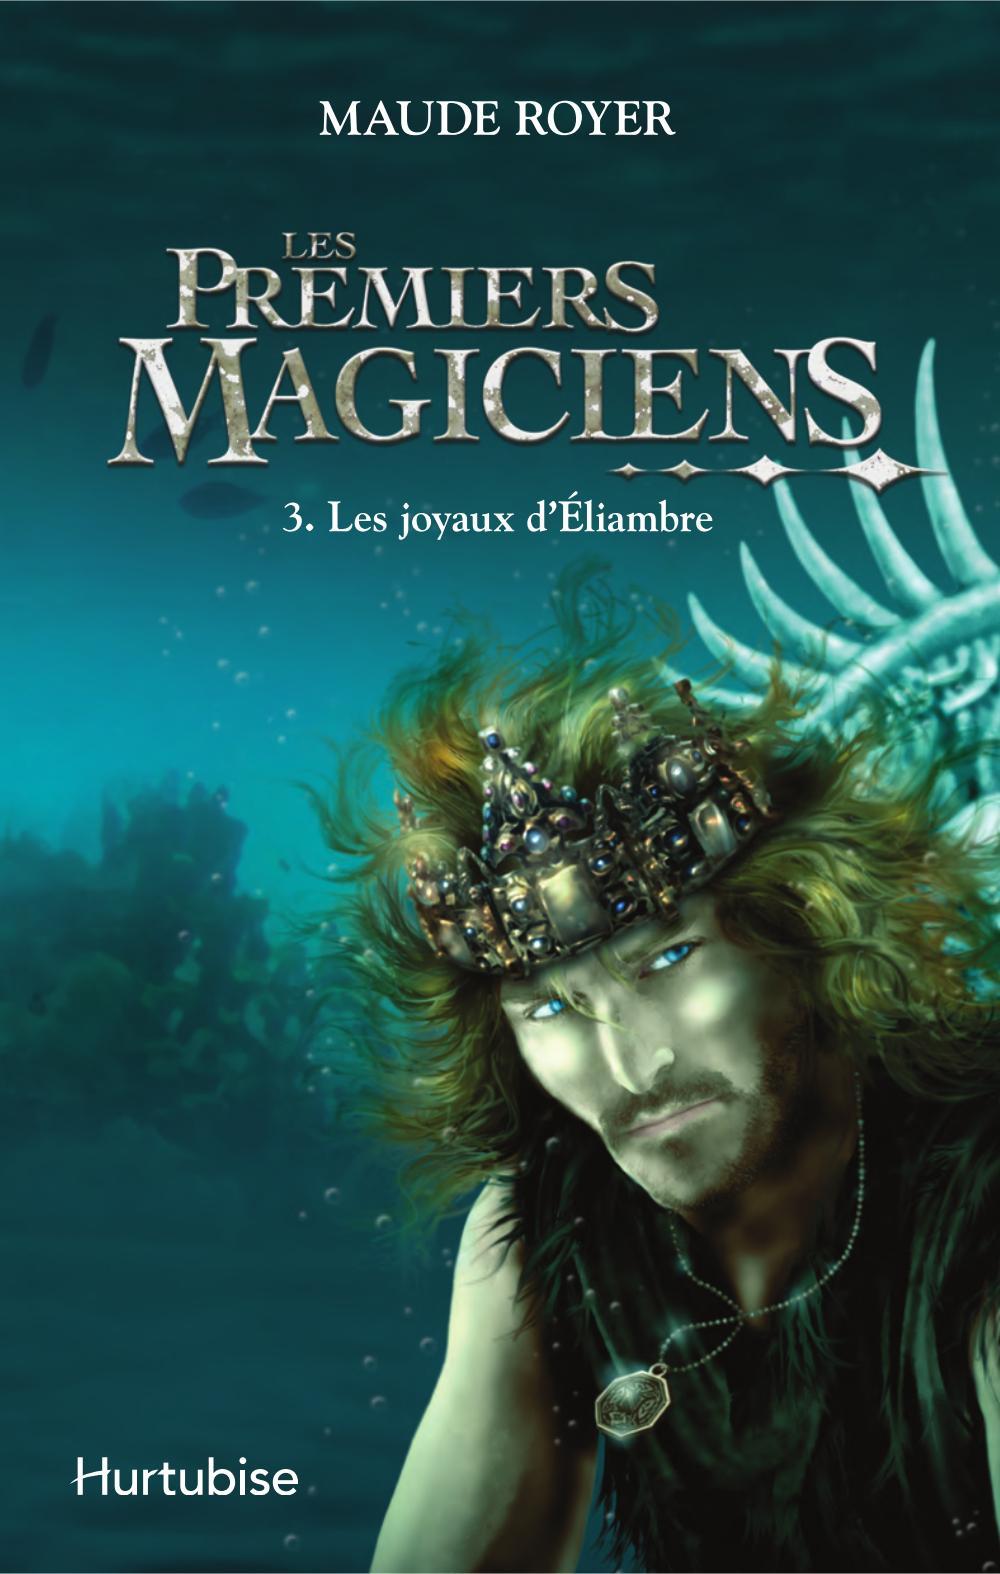 LES PREMIERS MAGICIENS V 03 LES JOYAUX D'ELIAMBRE